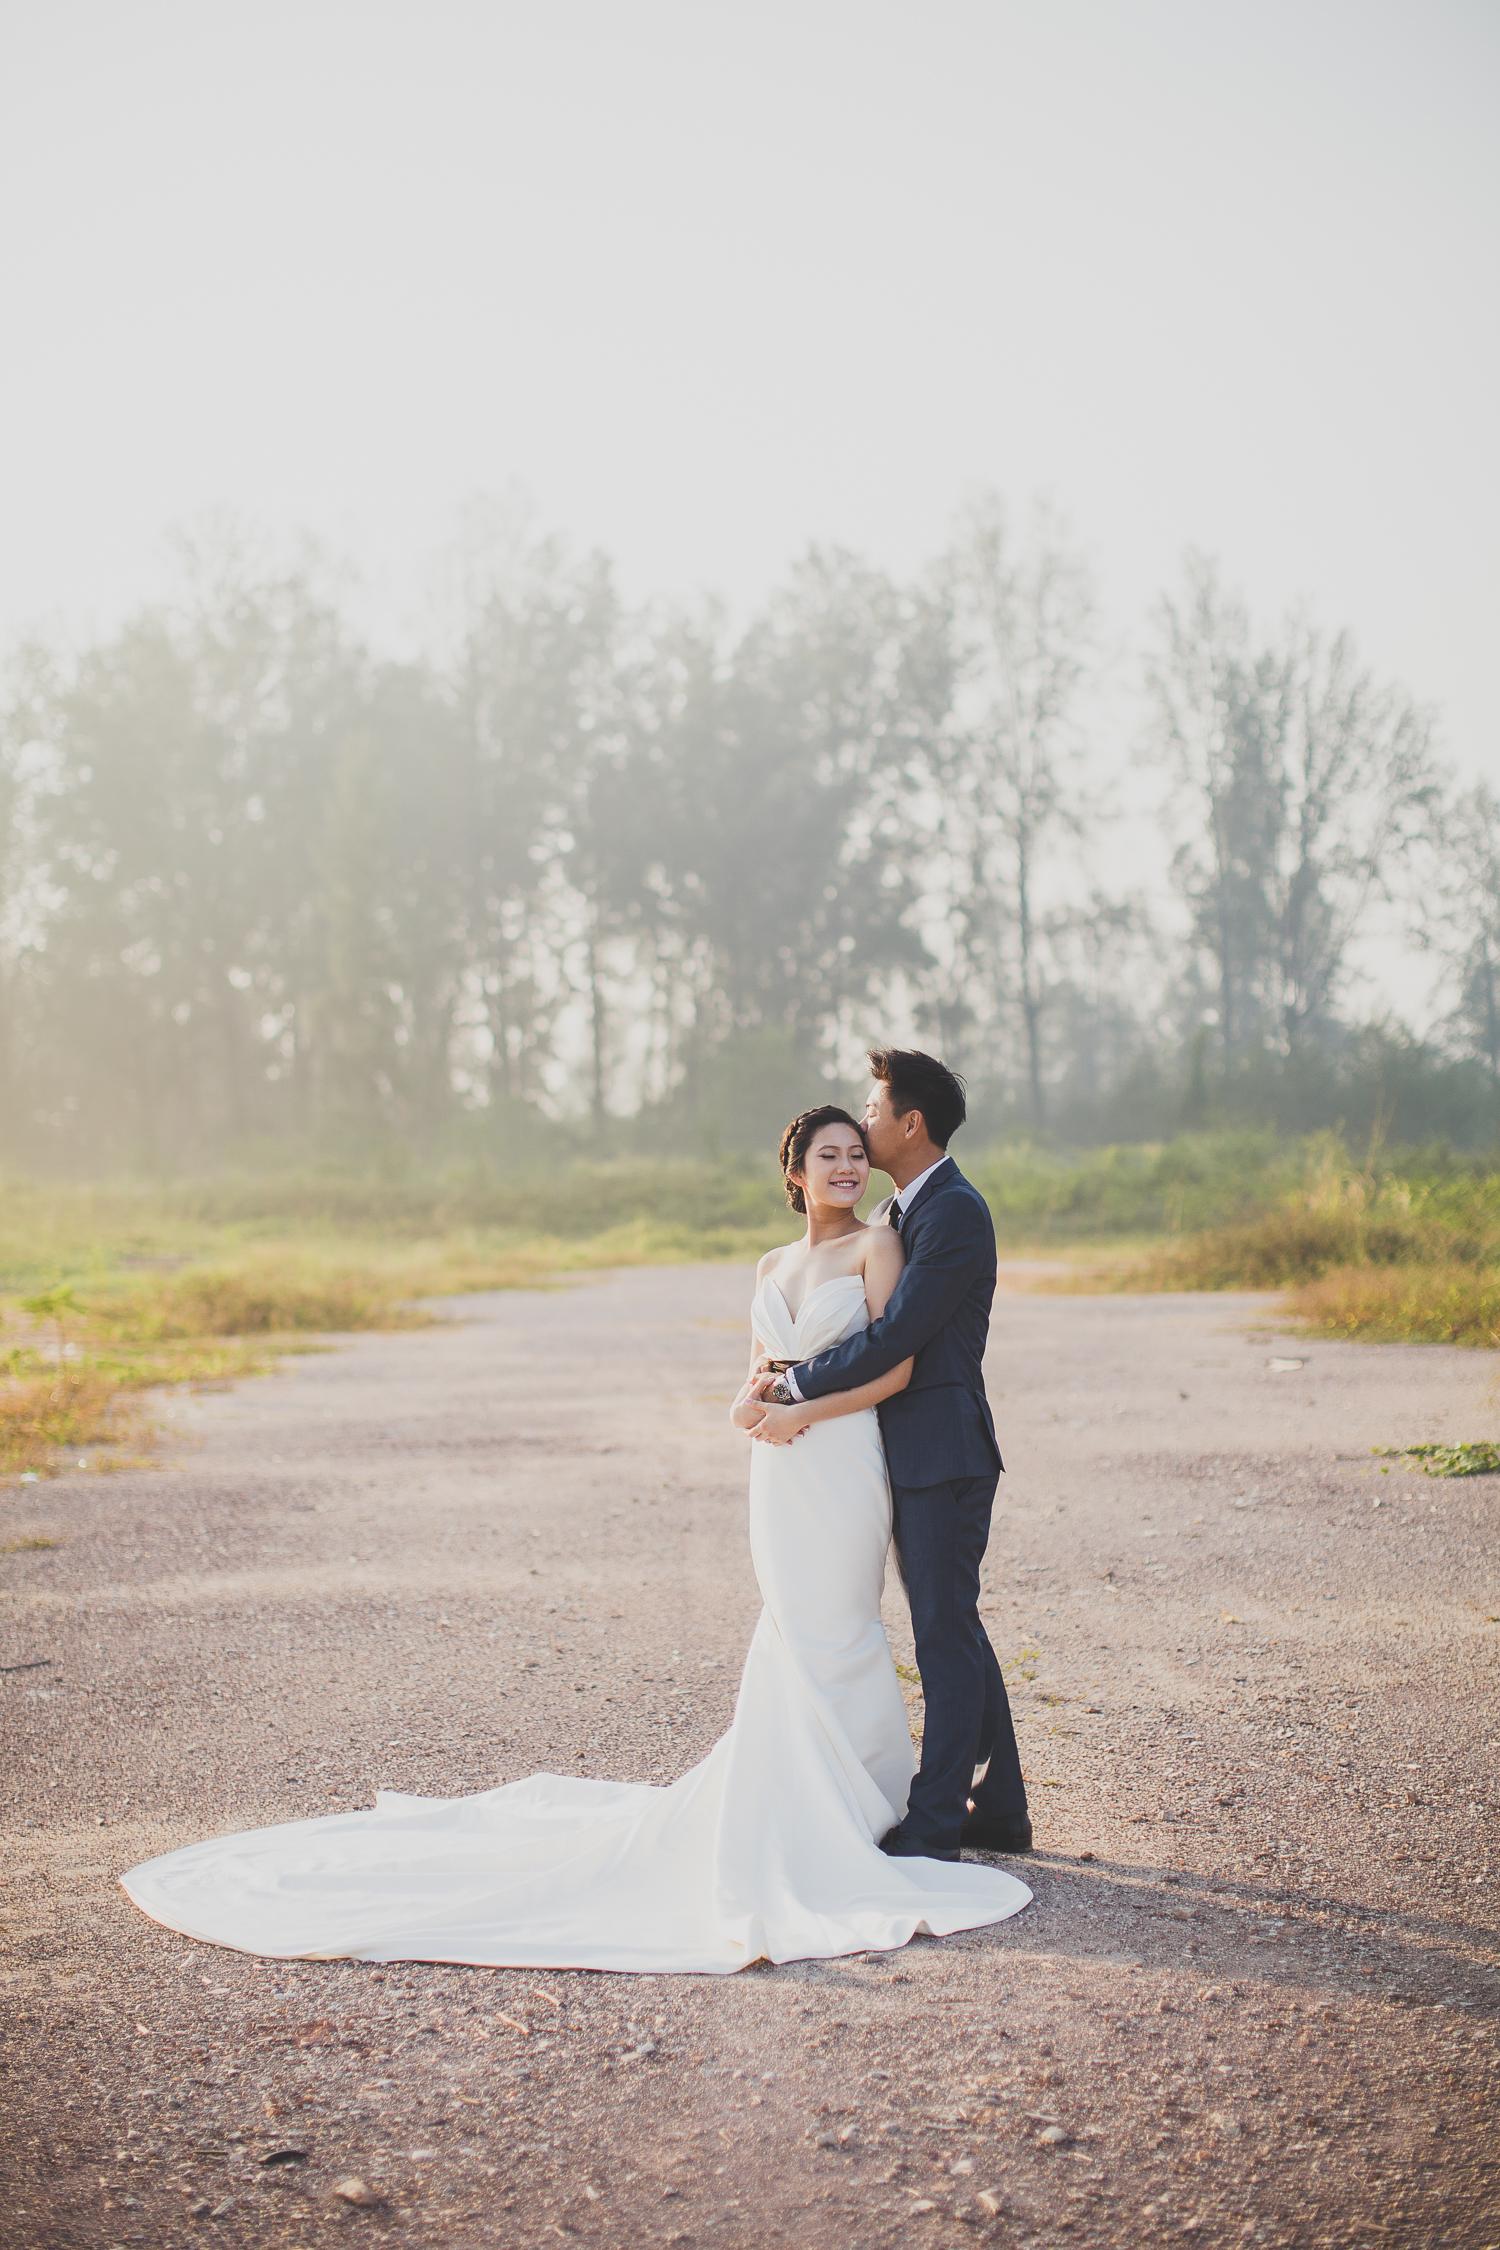 Singapore+Pre+Wedding+Photographer+Ziyang+Clara-0005.jpg